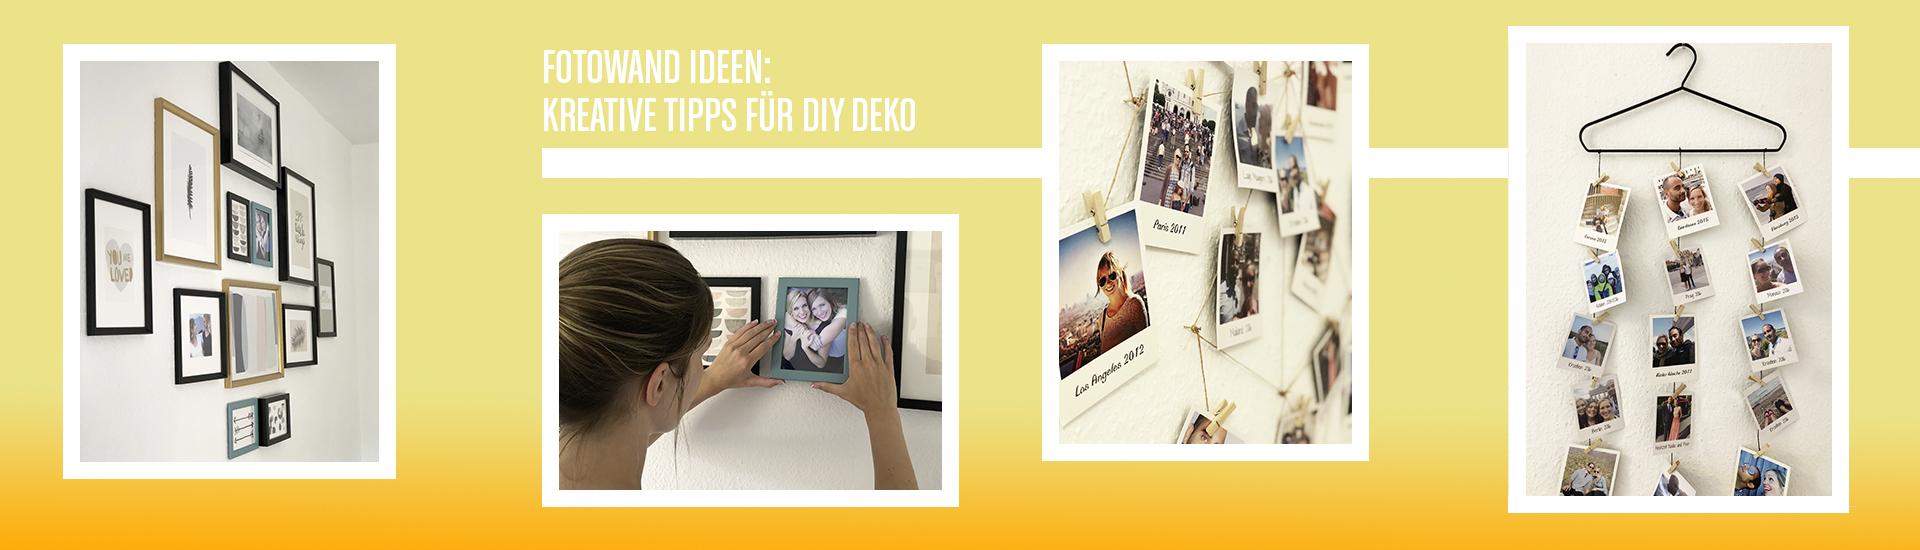 Fotowand Ideen Kreative Diy Deko Studioline Photography